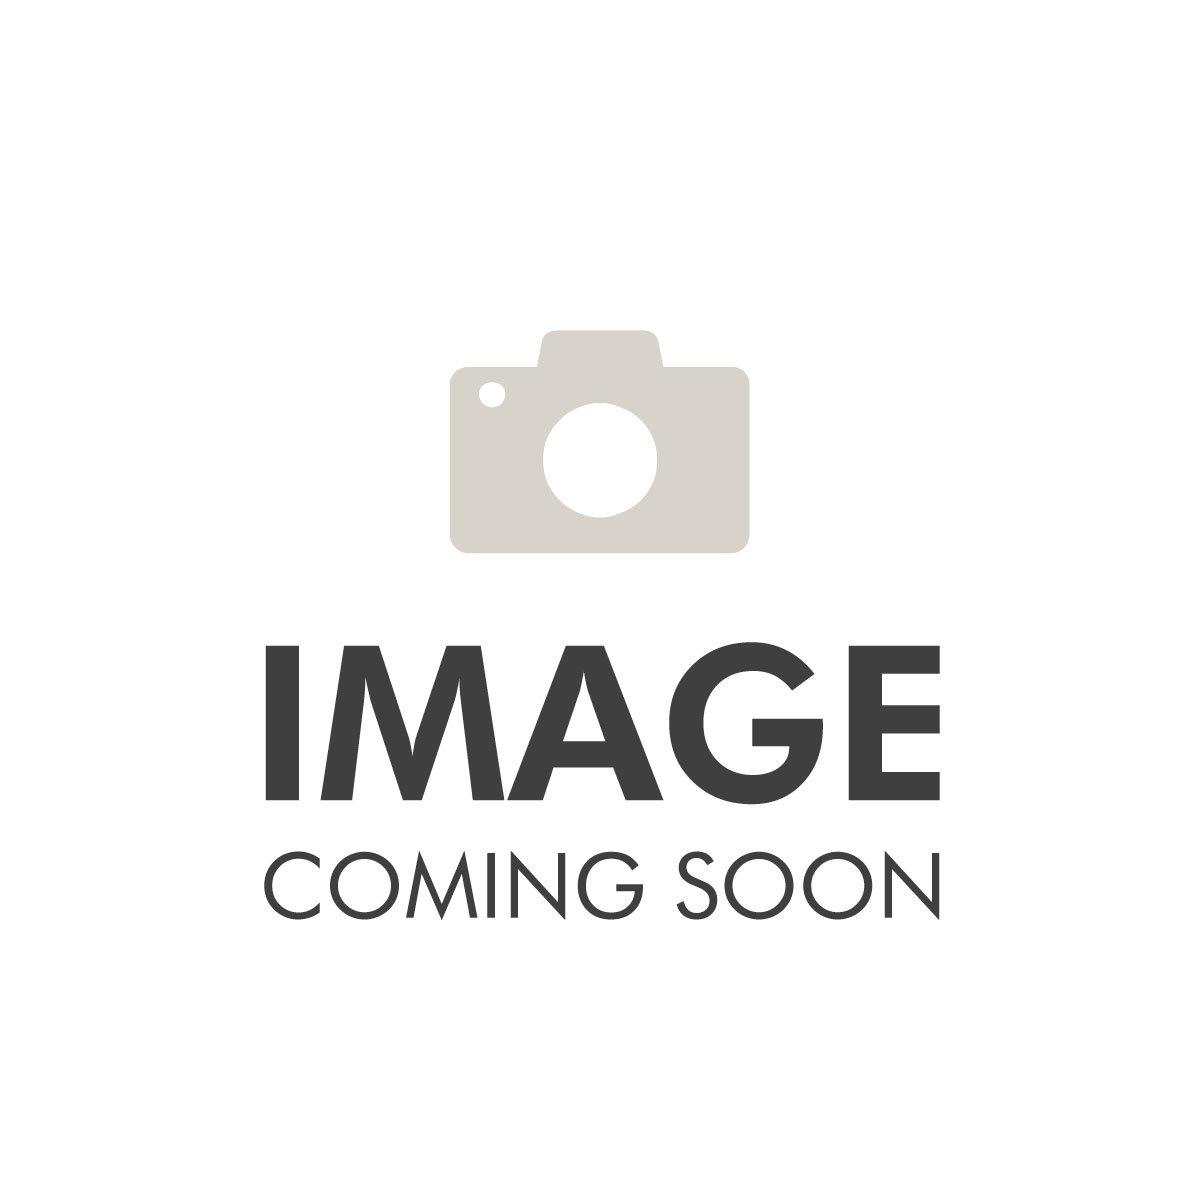 Giorgio Armani Emporio She 50ml EDP Spray